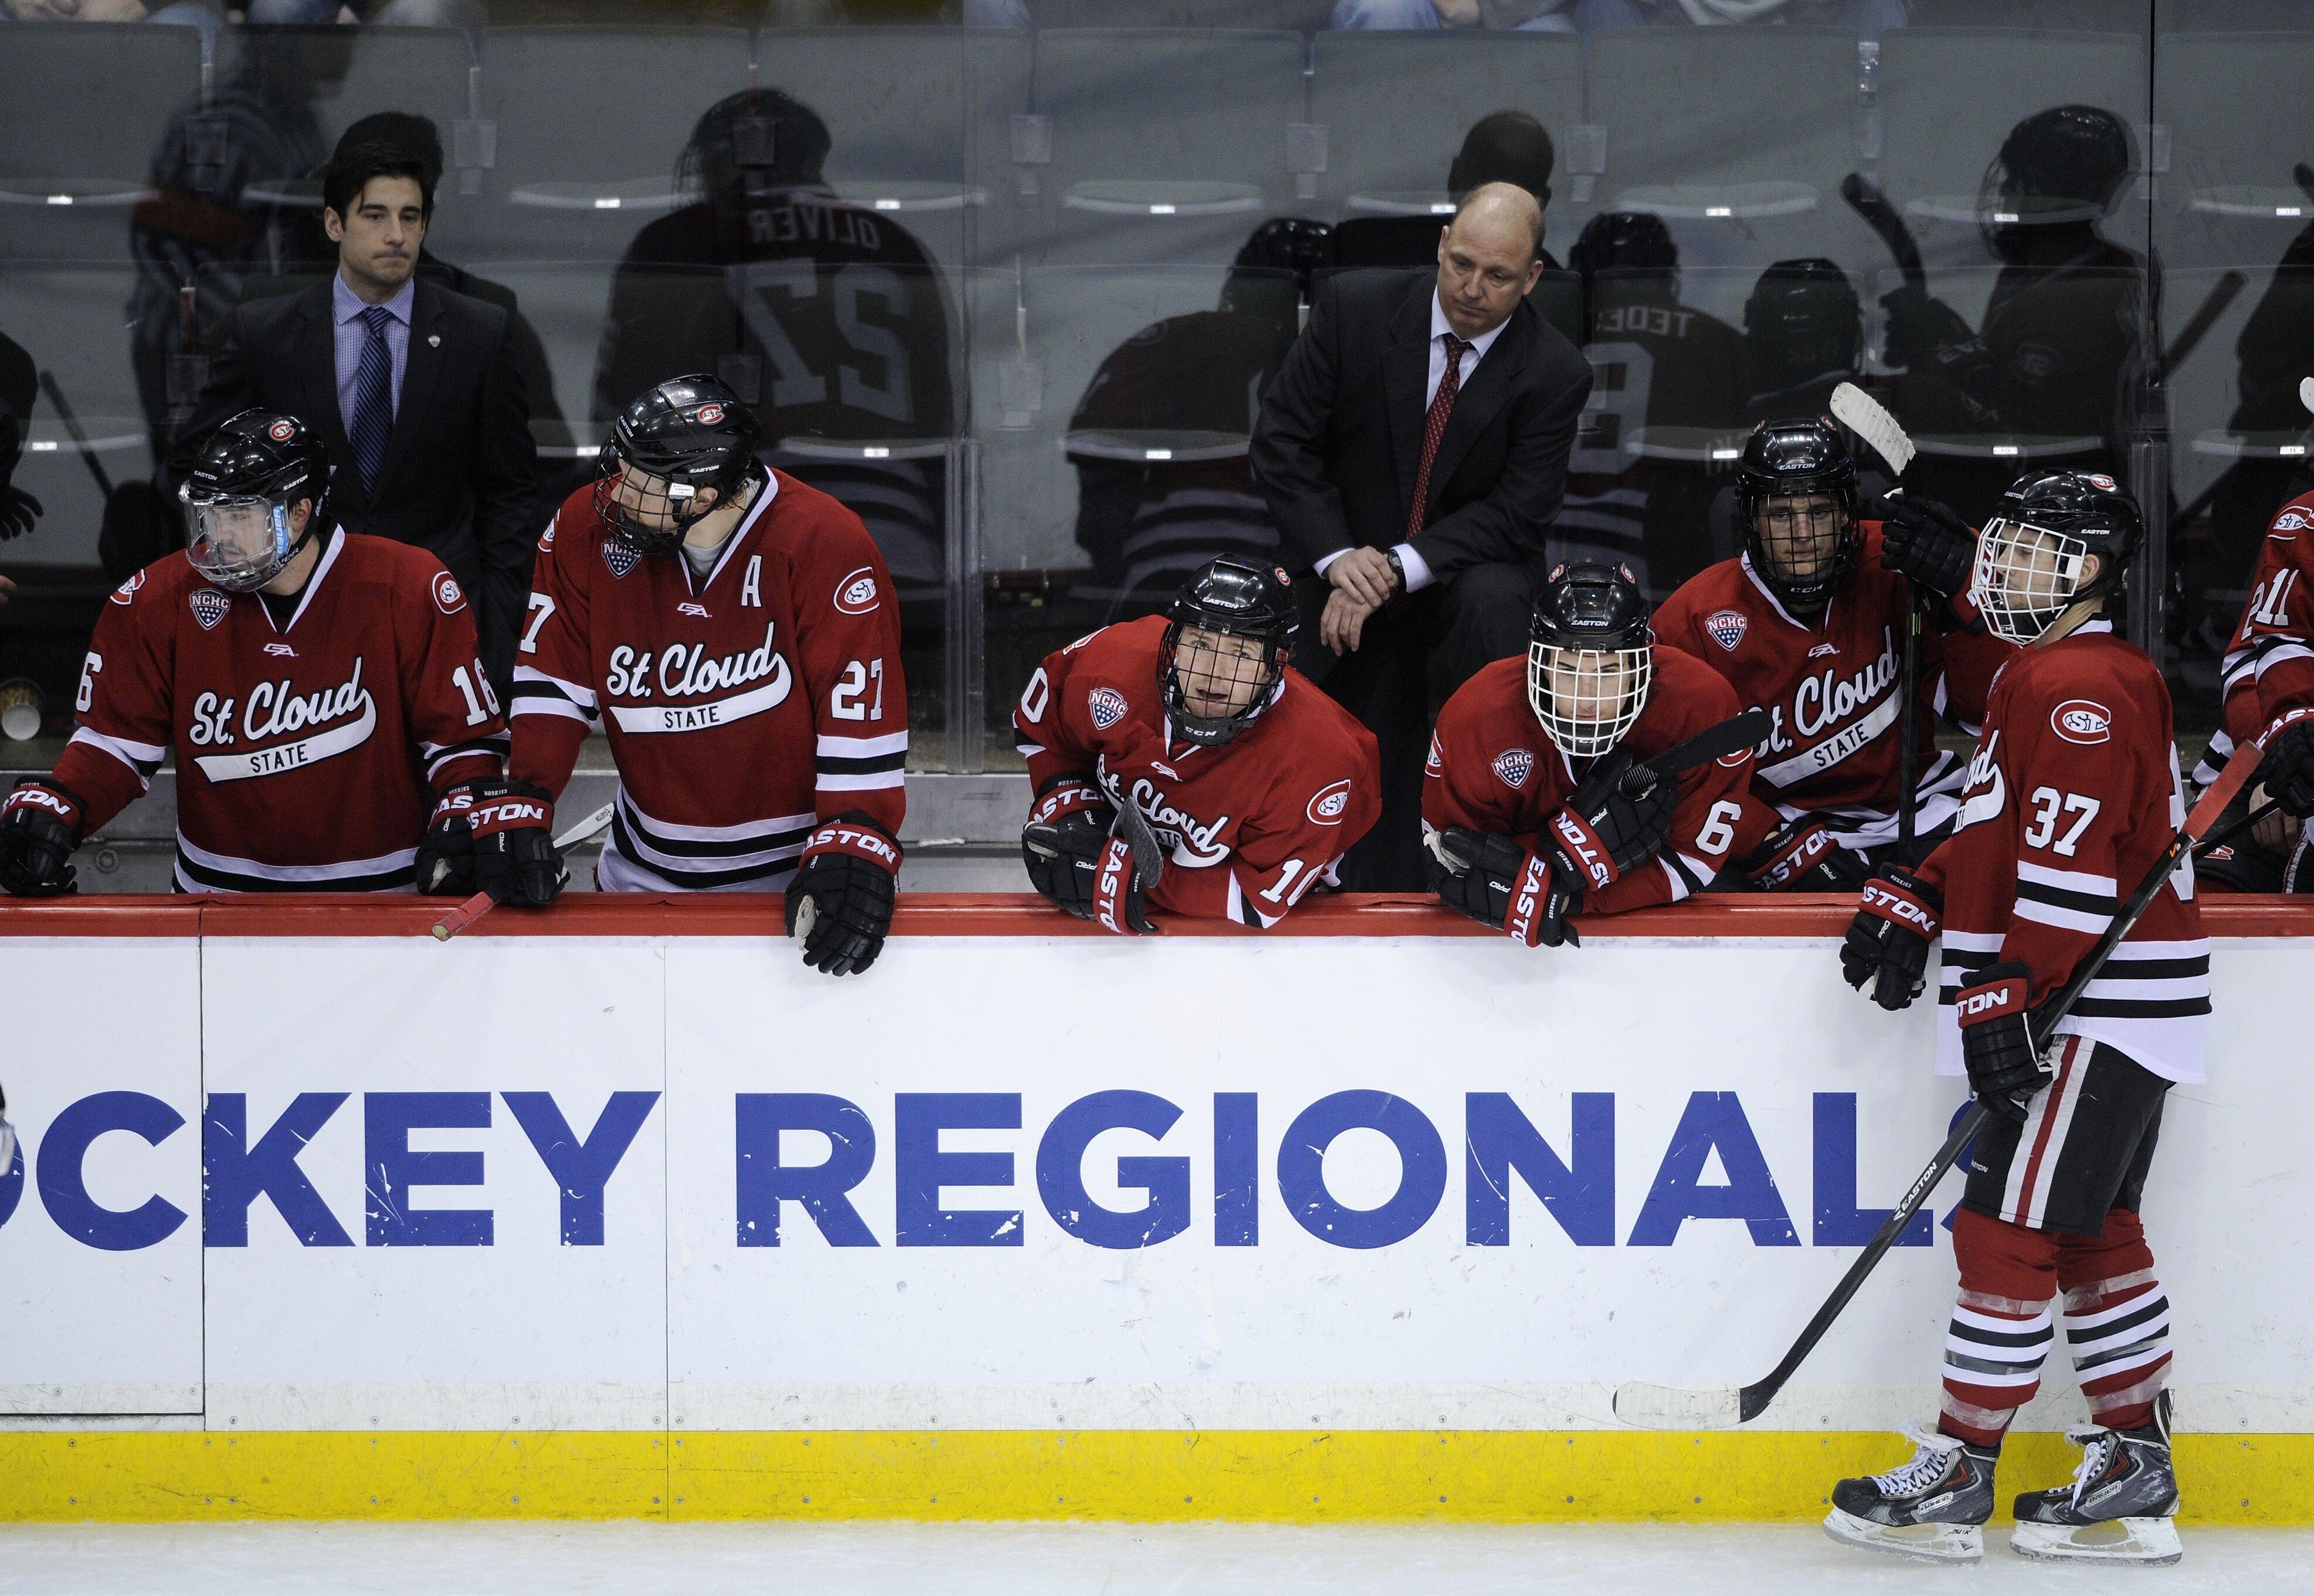 481642993-2014-ncaa-division-i-mens-ice-hockey-championship-west-regional.jpg